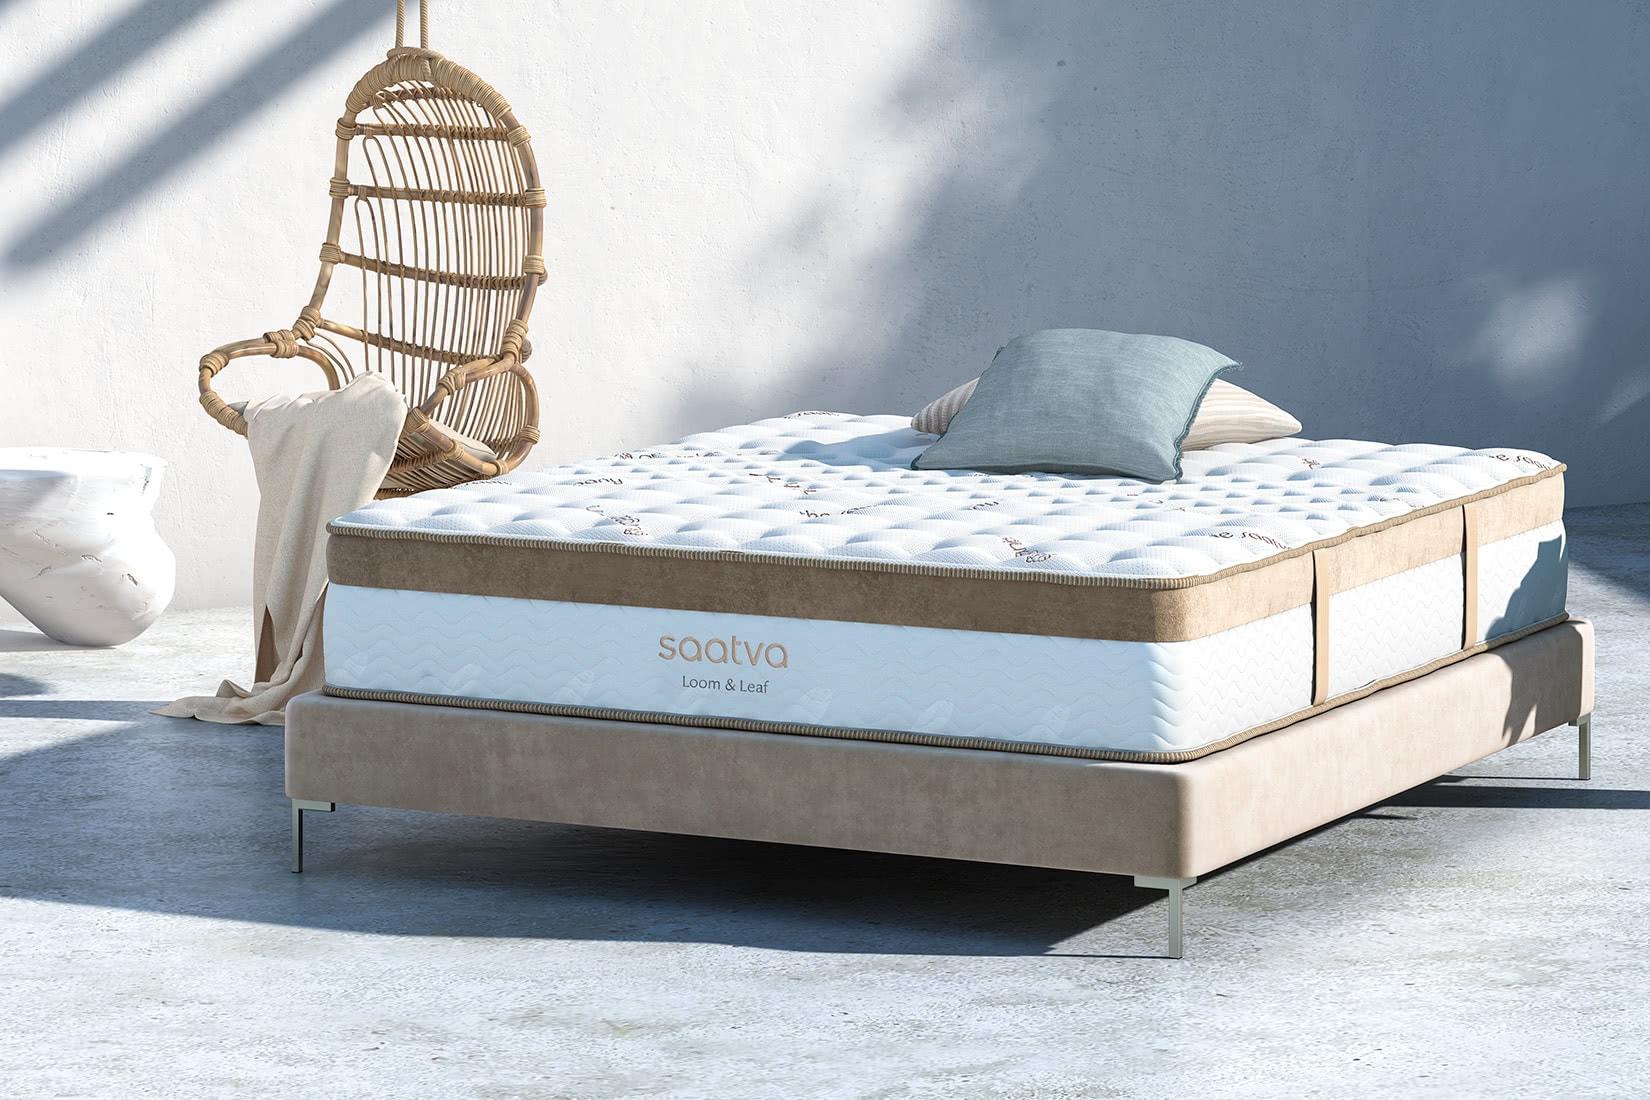 Loom & Leaf luxury mattress review - Luxe Digital